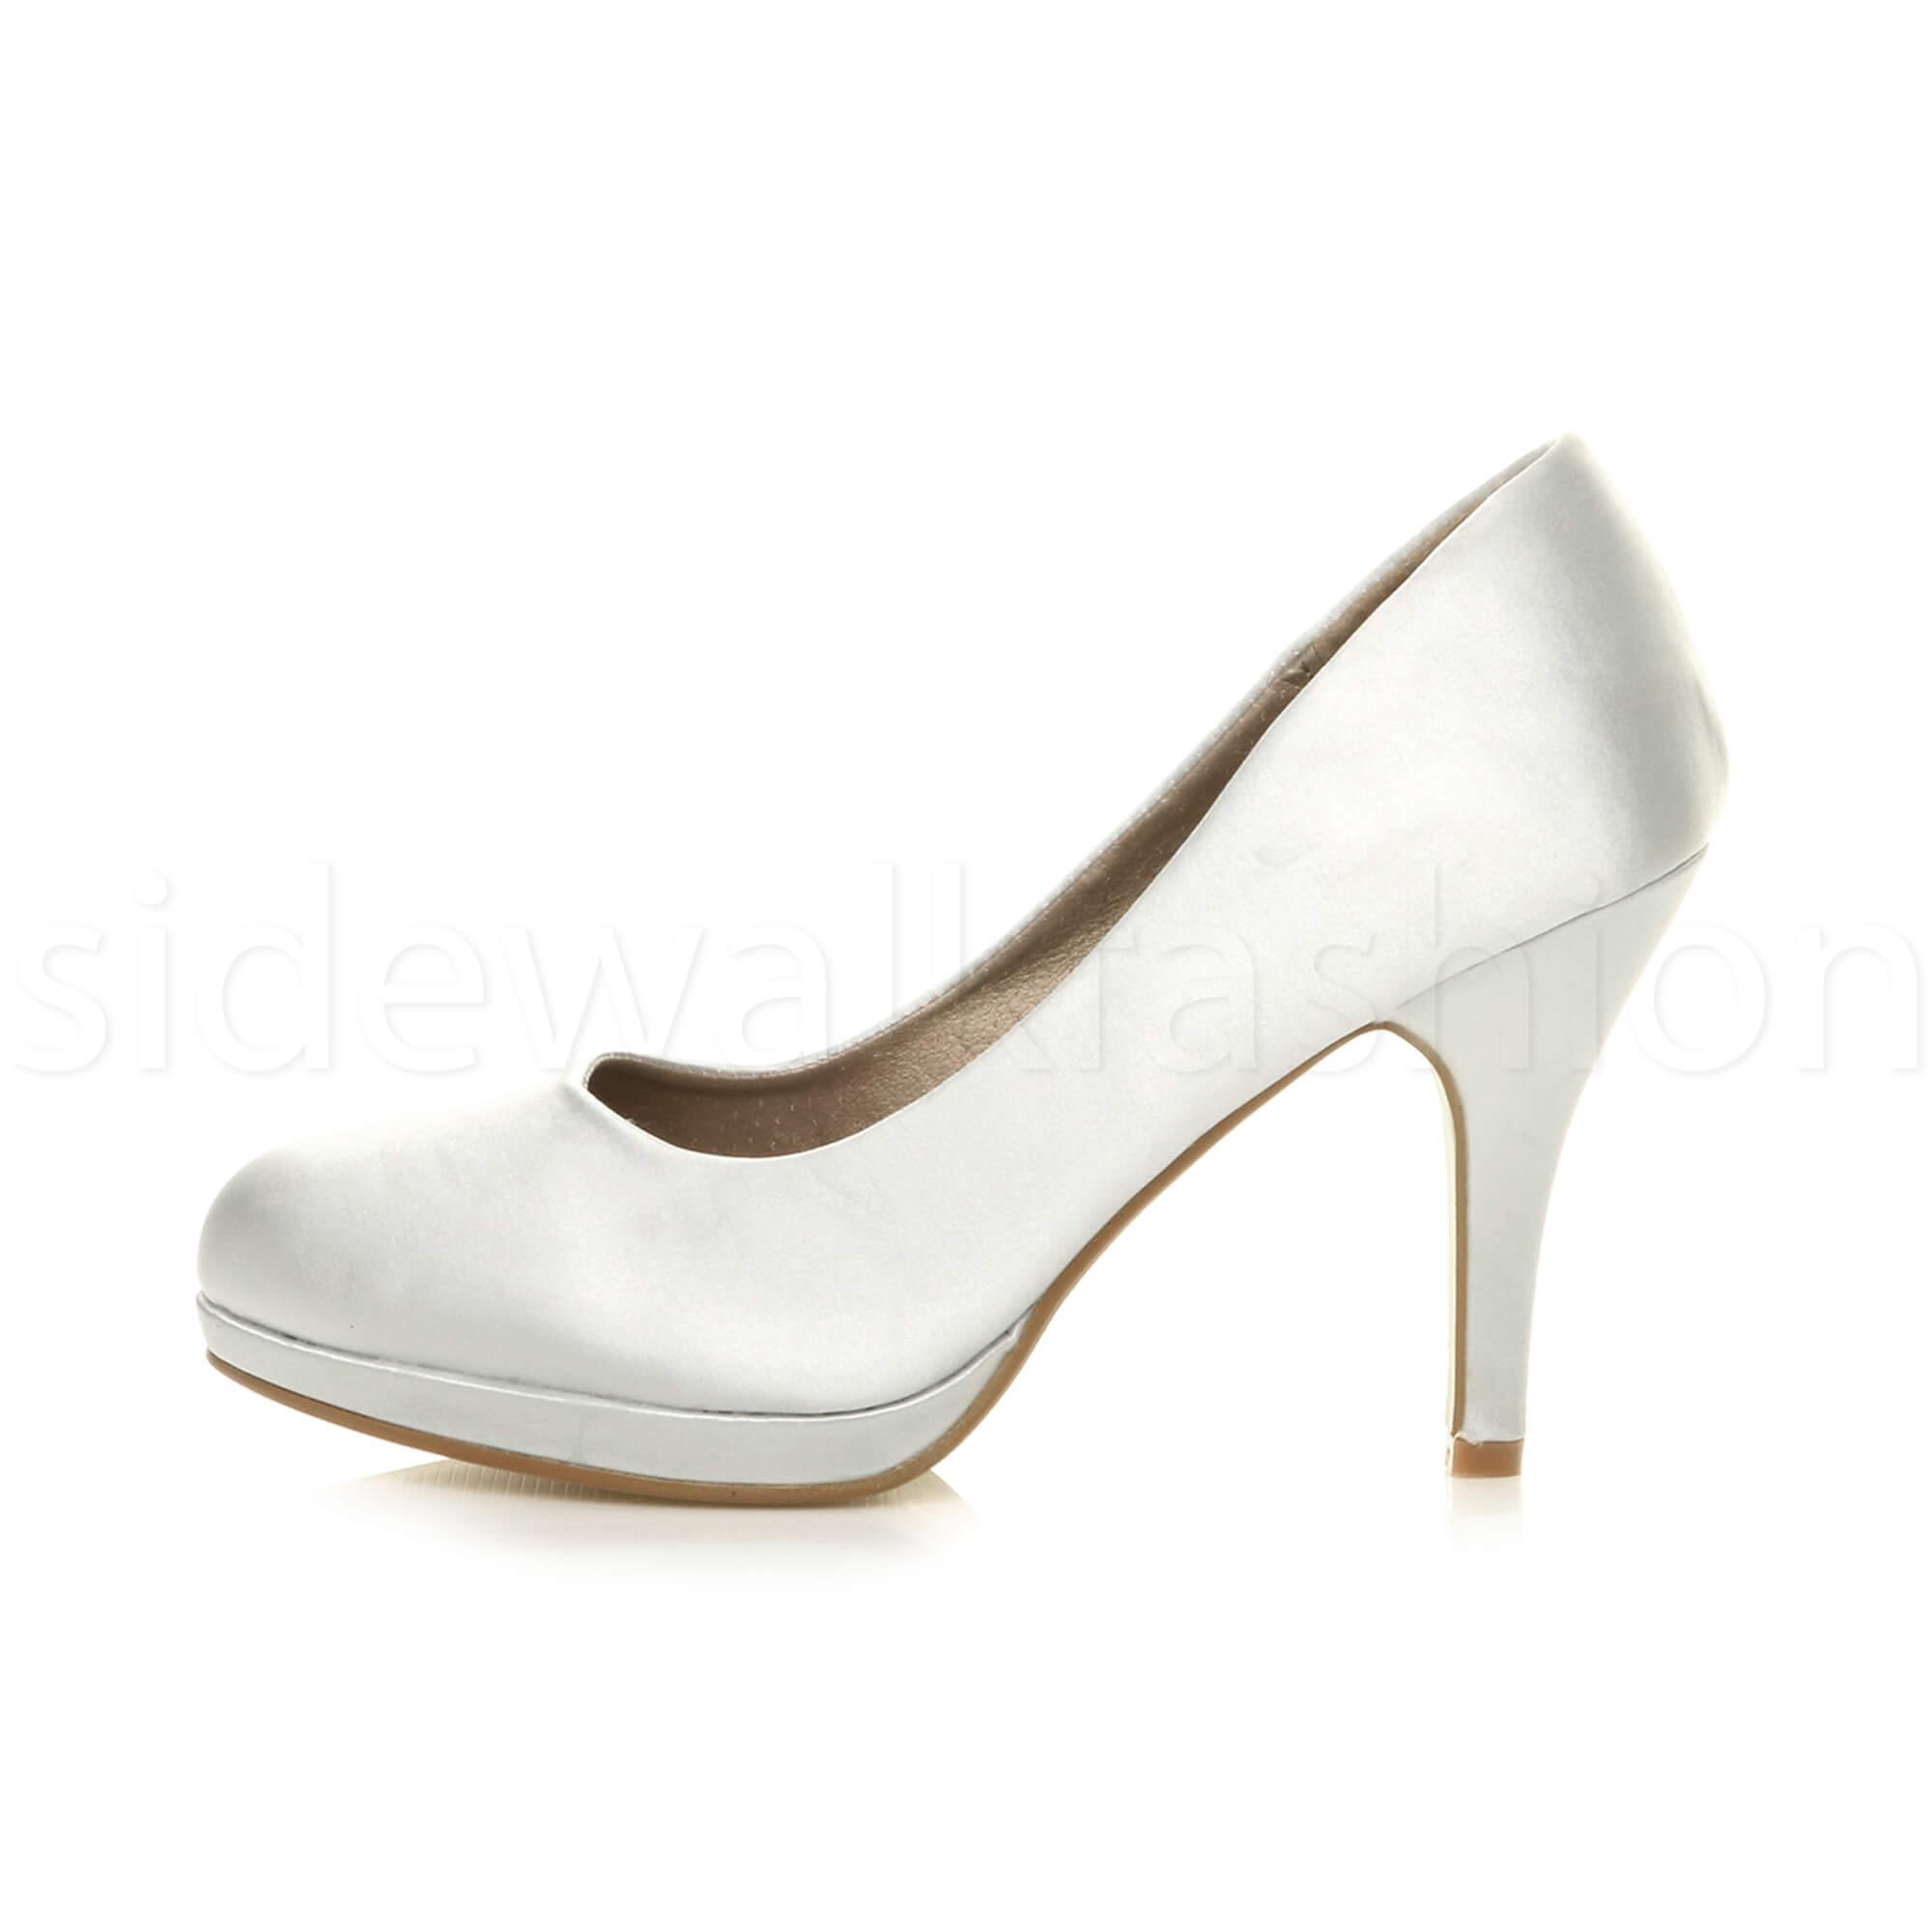 Womens-ladies-high-mid-heel-platform-wedding-evening-bridesmaid-court-shoes-size thumbnail 185